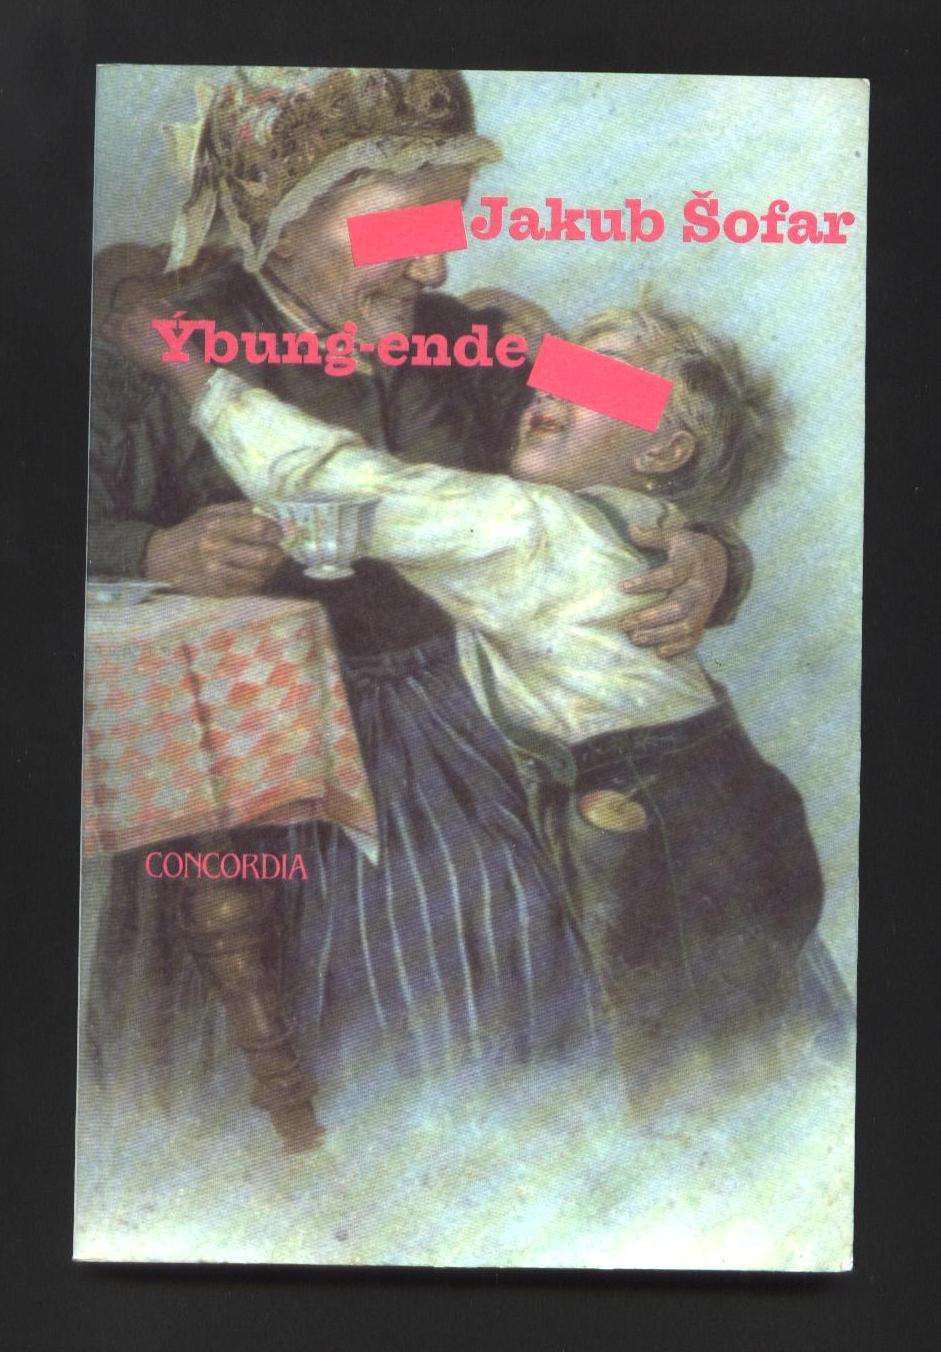 Ýbung-ende - Jakub Šofar (podpis autora)